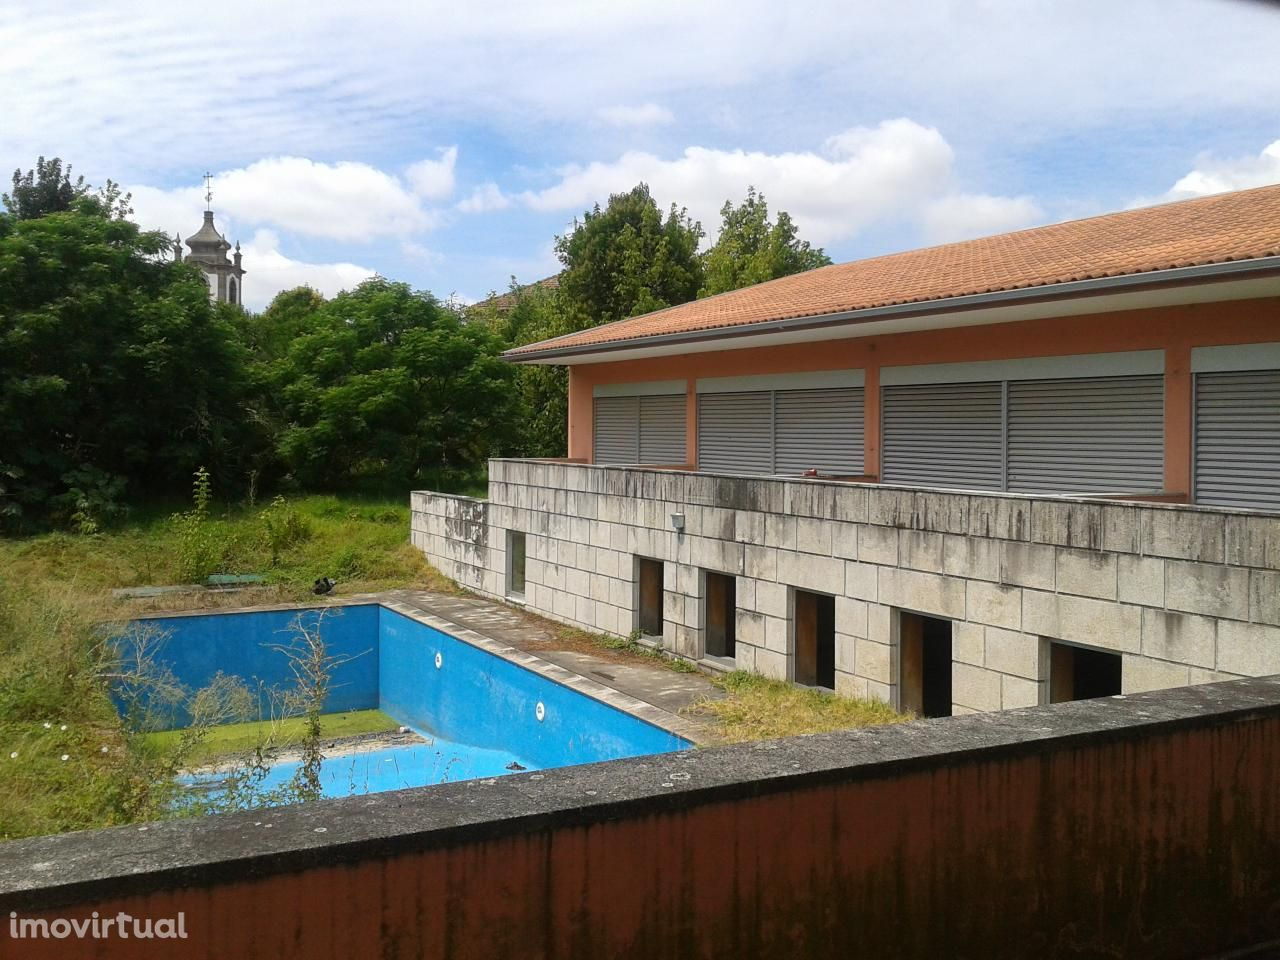 Moradia c/ piscina e logradouro - Vizela